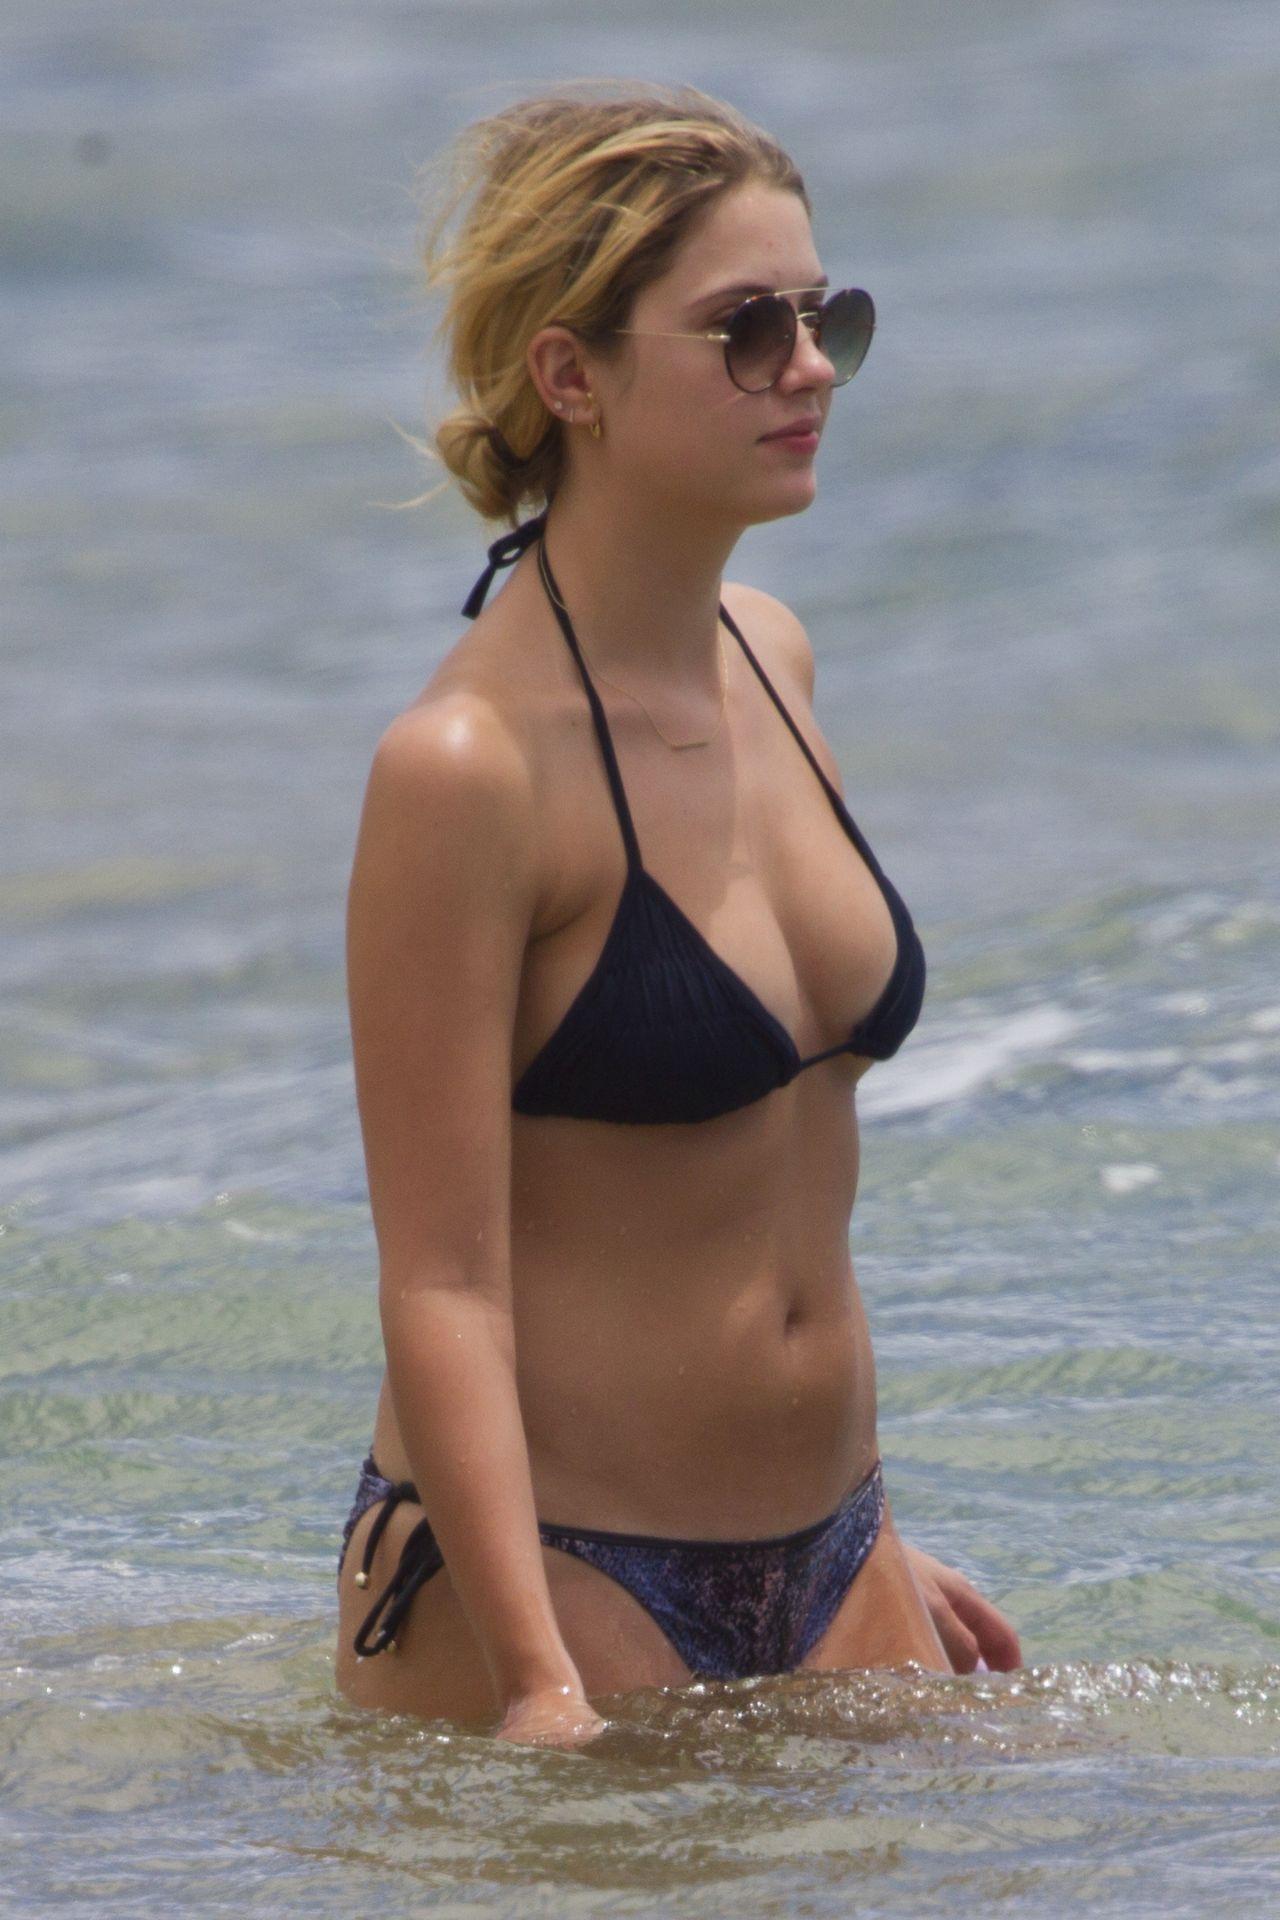 Ashley Benson Bikini Bodies Pic 4 of 35